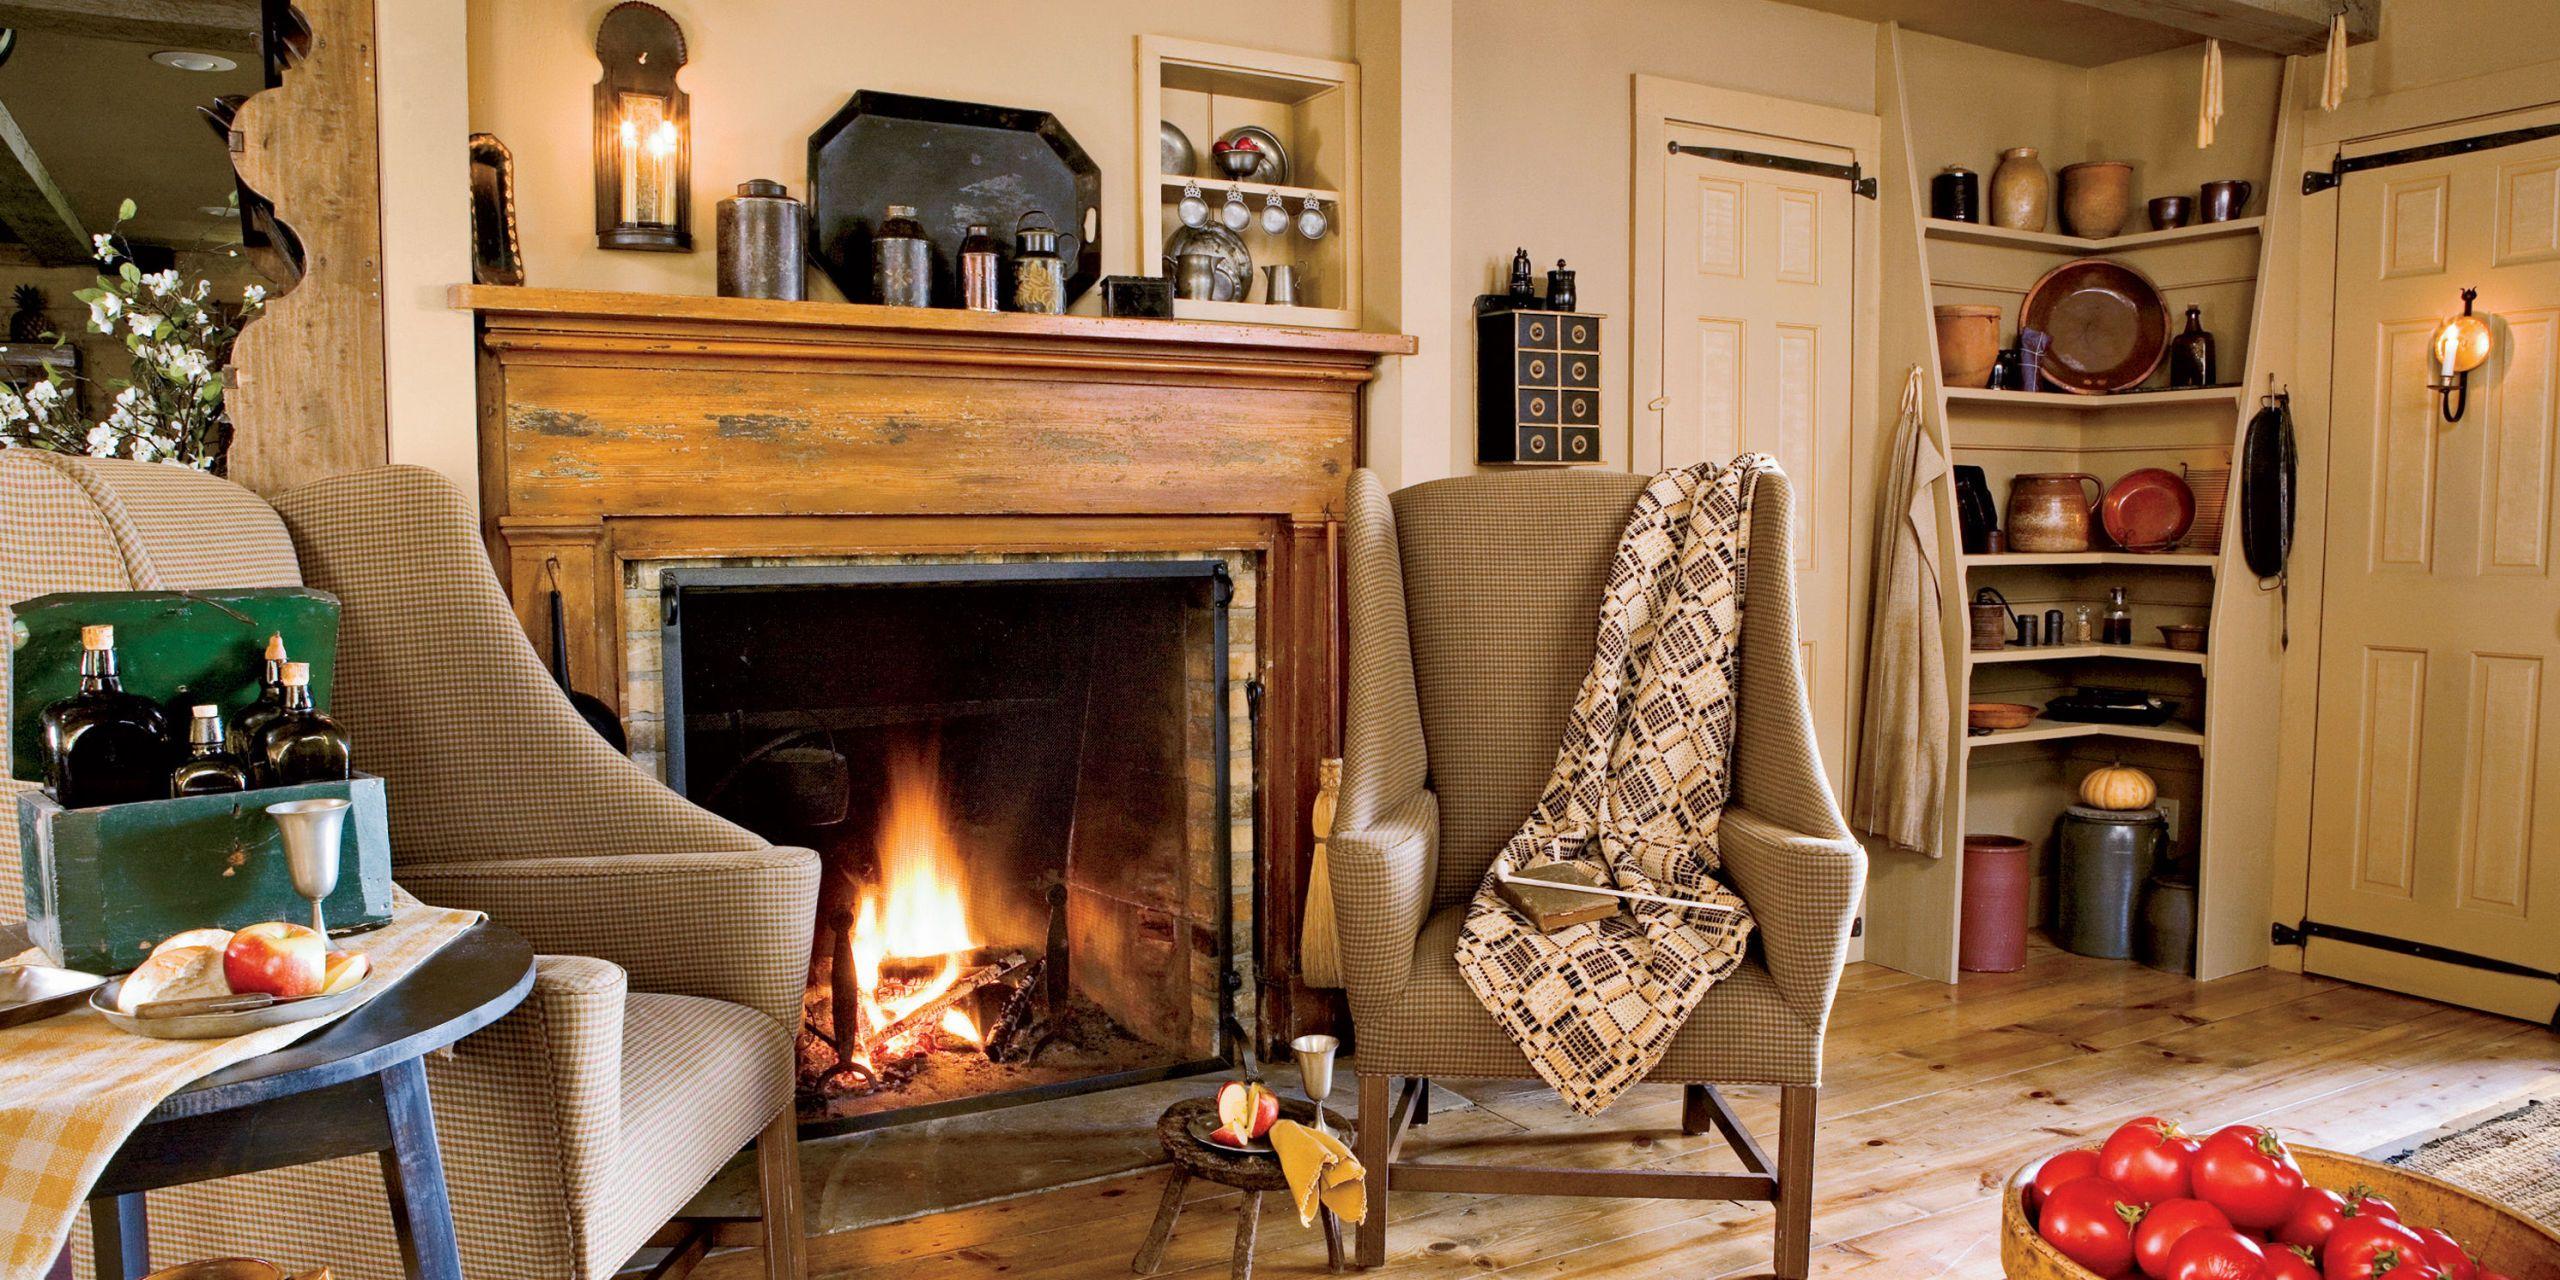 Home design ideas fireplace.